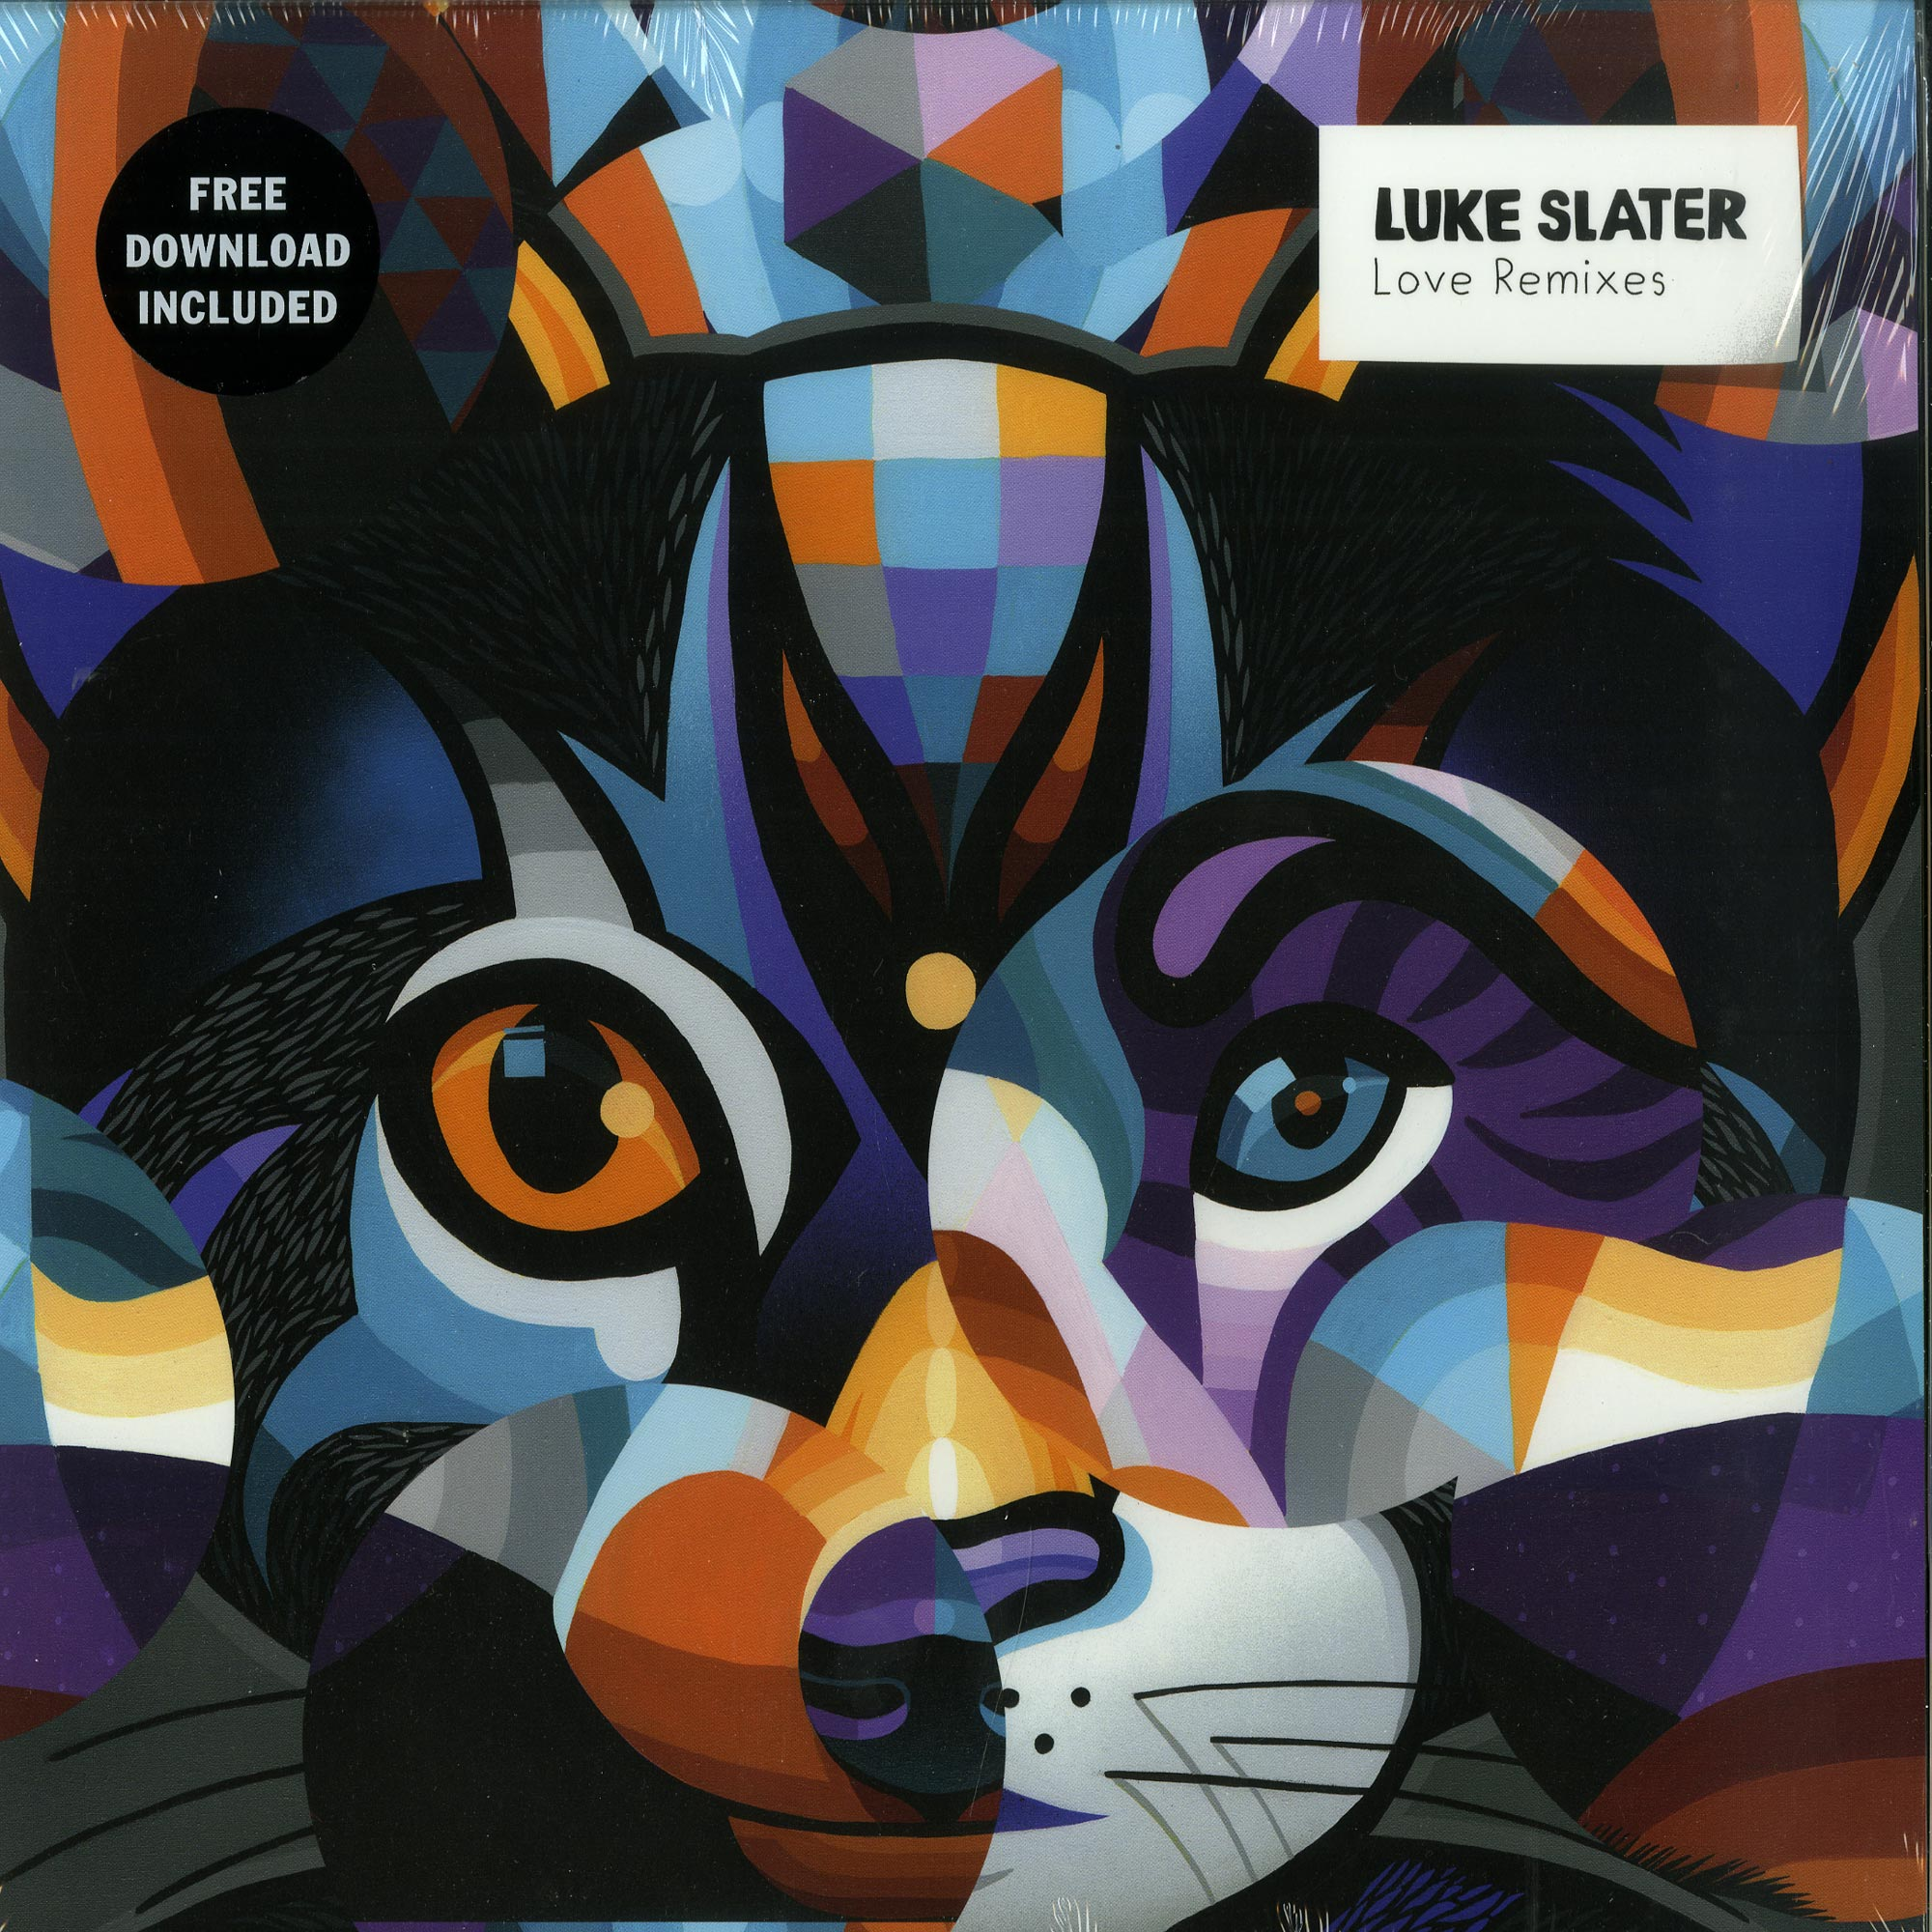 Luke Slater - LOVE REMIXES